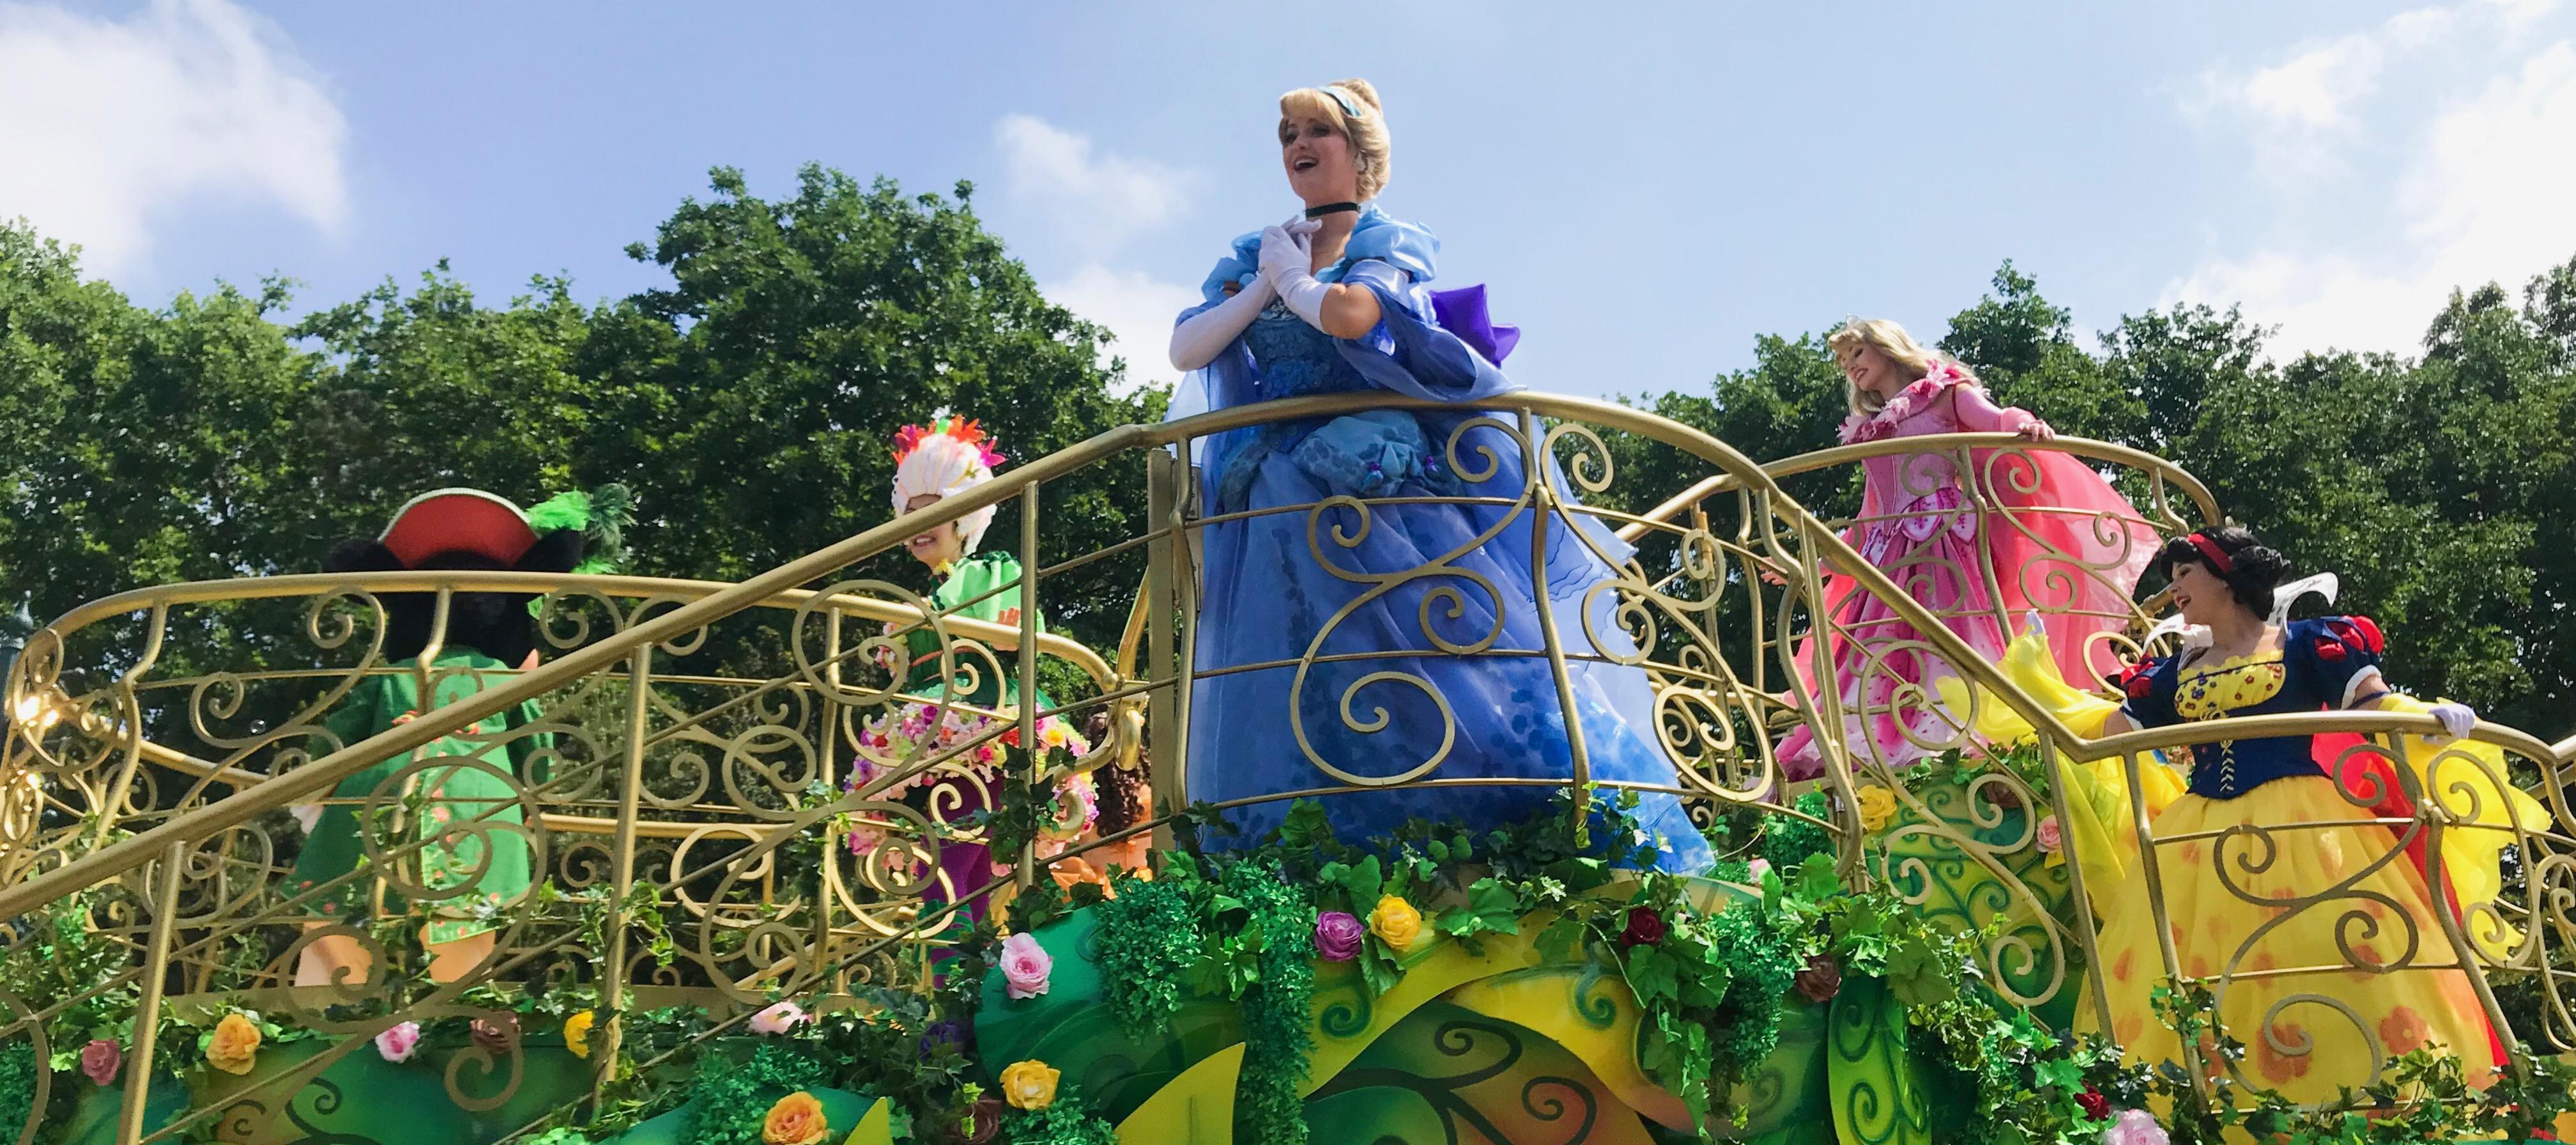 Cinderella during the Princess Parade in Disneyland Paris